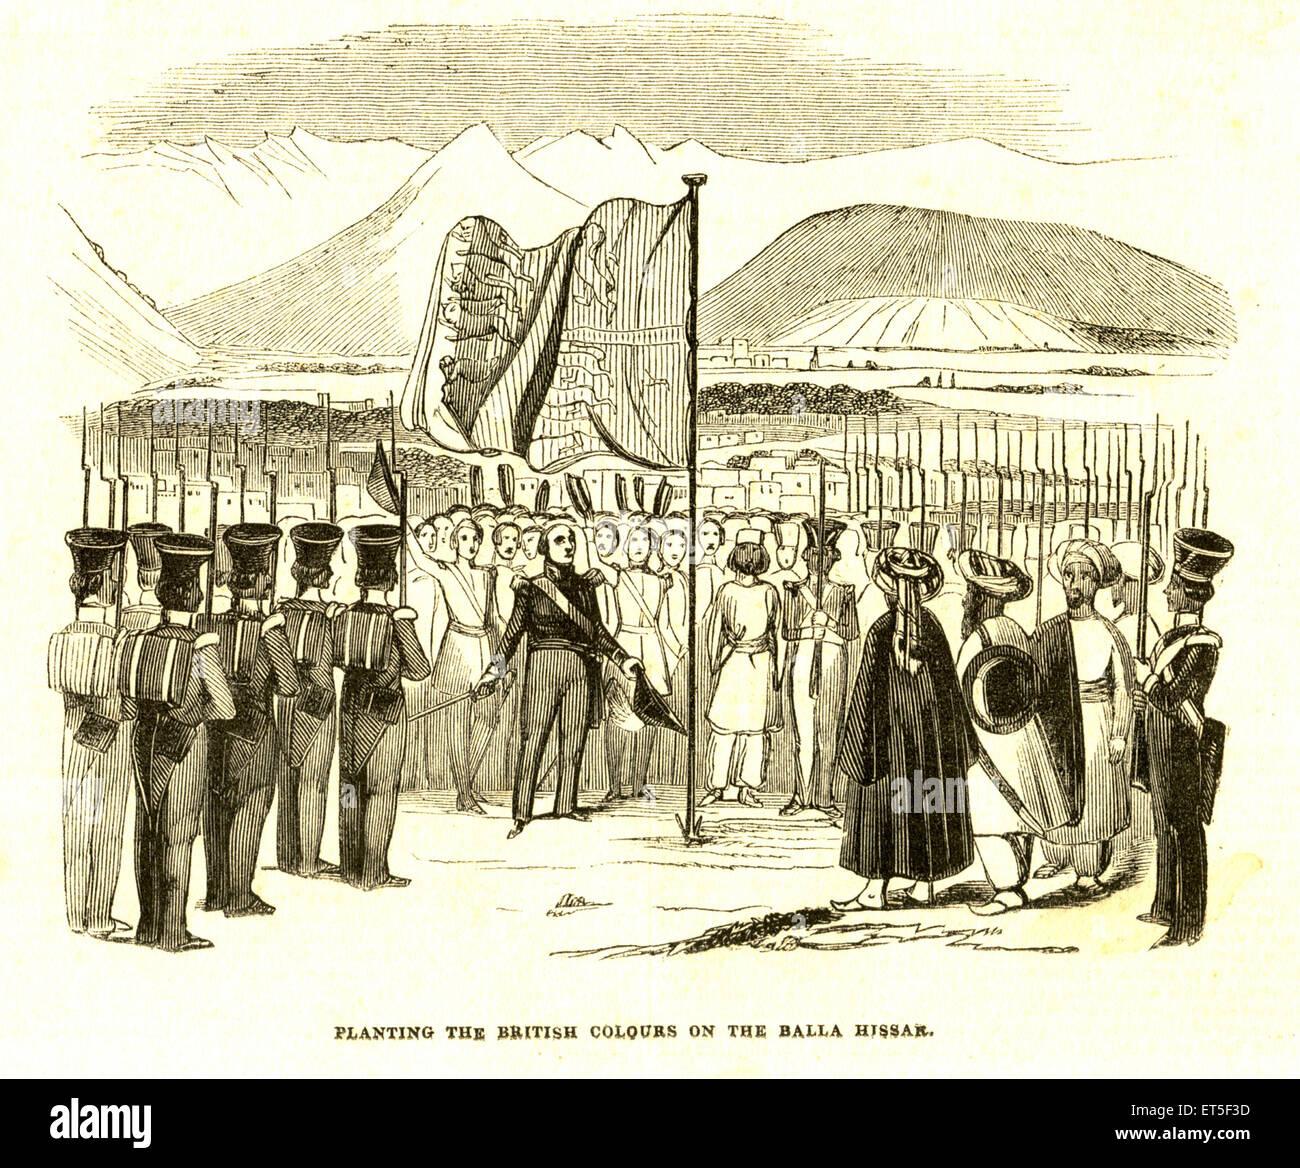 Military and munity mutiny Views Planting the British colors on Balla Hissar ; India - Stock Image